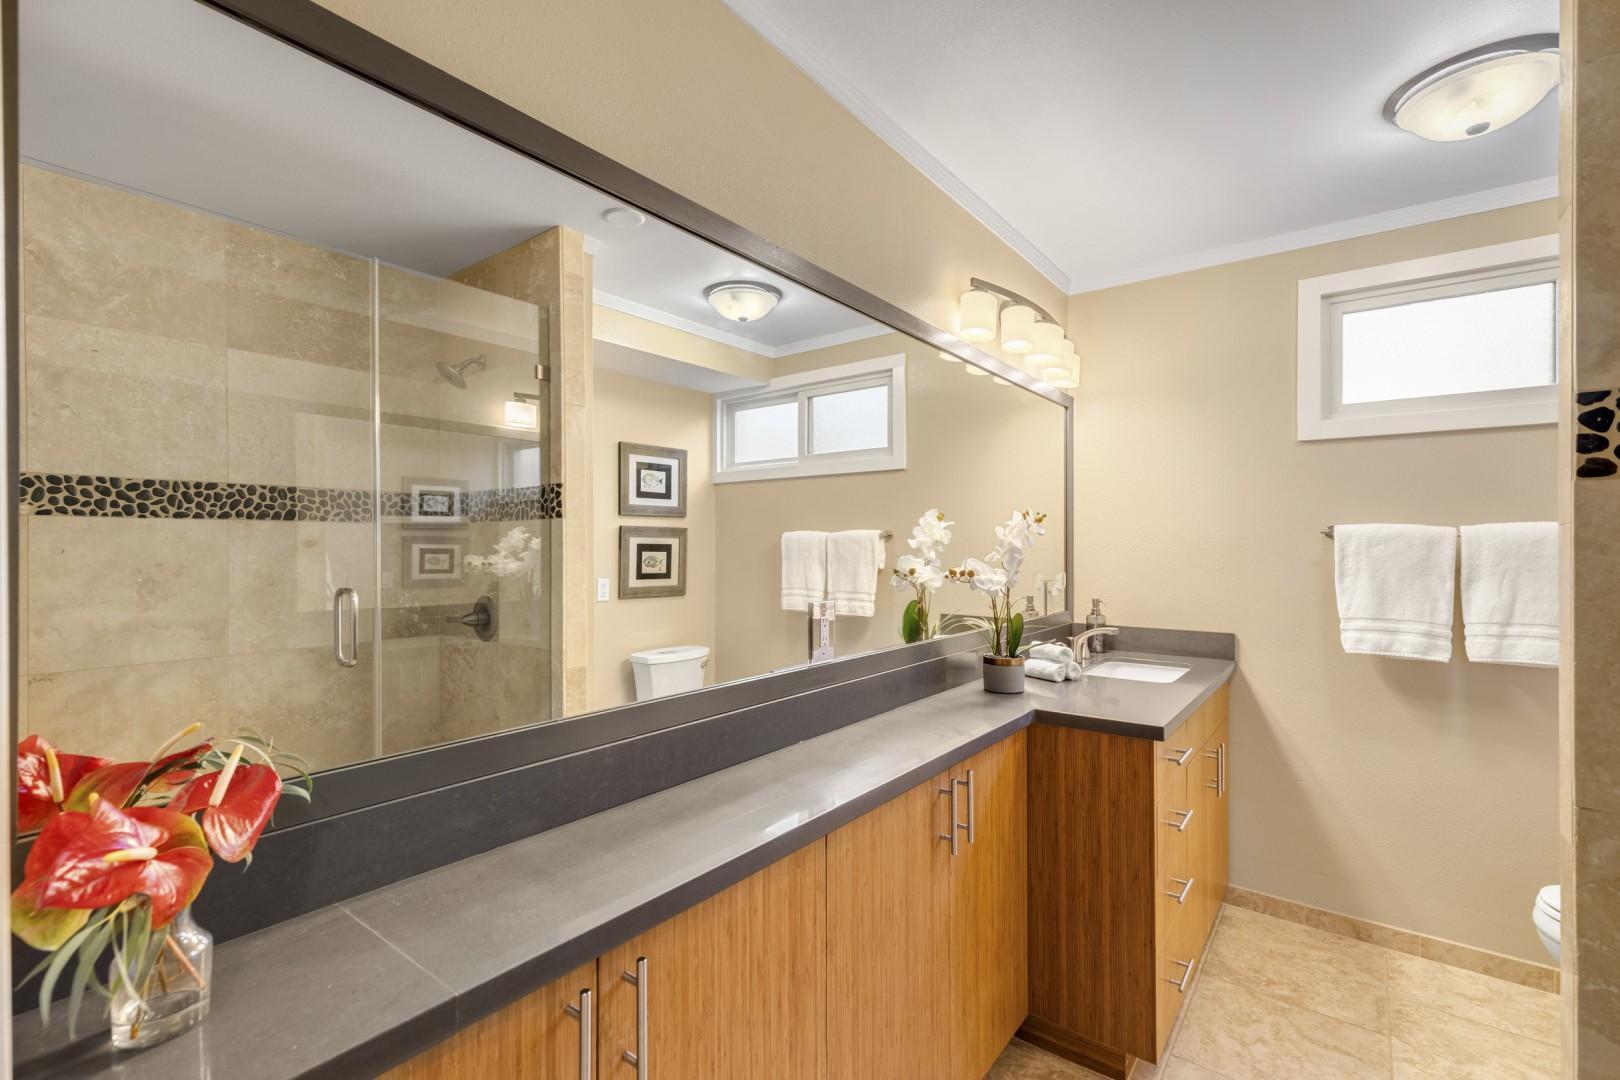 Downstairs bathroom with custom tile shower